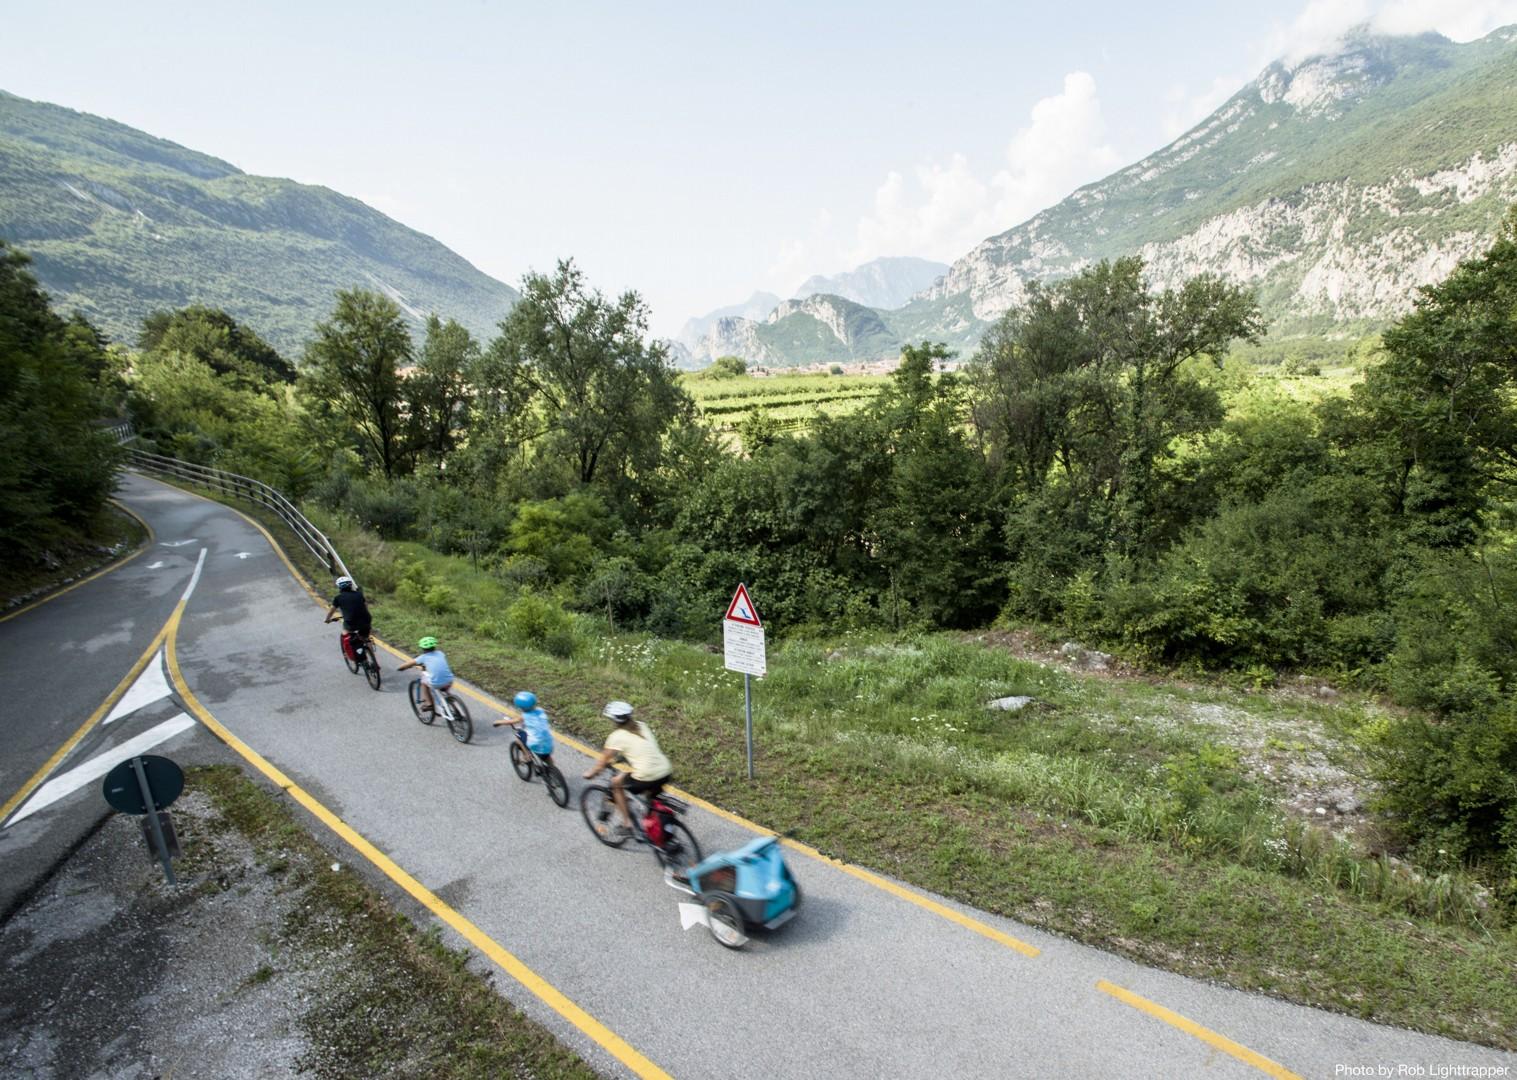 Family-Cycling-Holiday-Lake-Garda-Venice-beautiful-Italy.jpg - Italy - Lake Garda to Venice - Self-Guided Family Cycling Holiday - Family Cycling